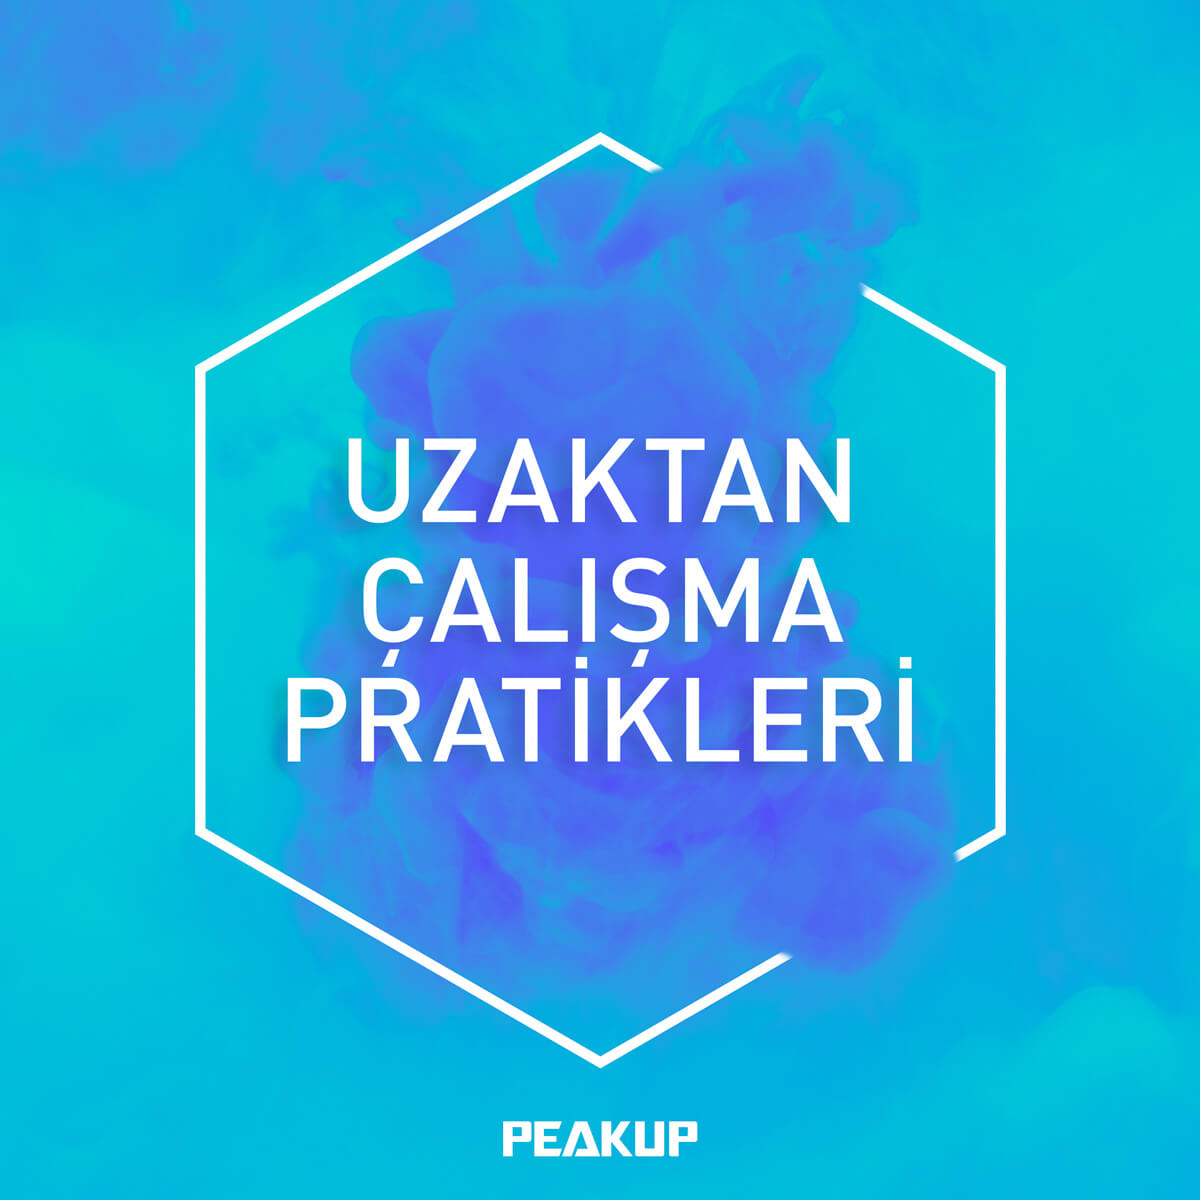 uzaktan_calisma_pratikleri_template-1